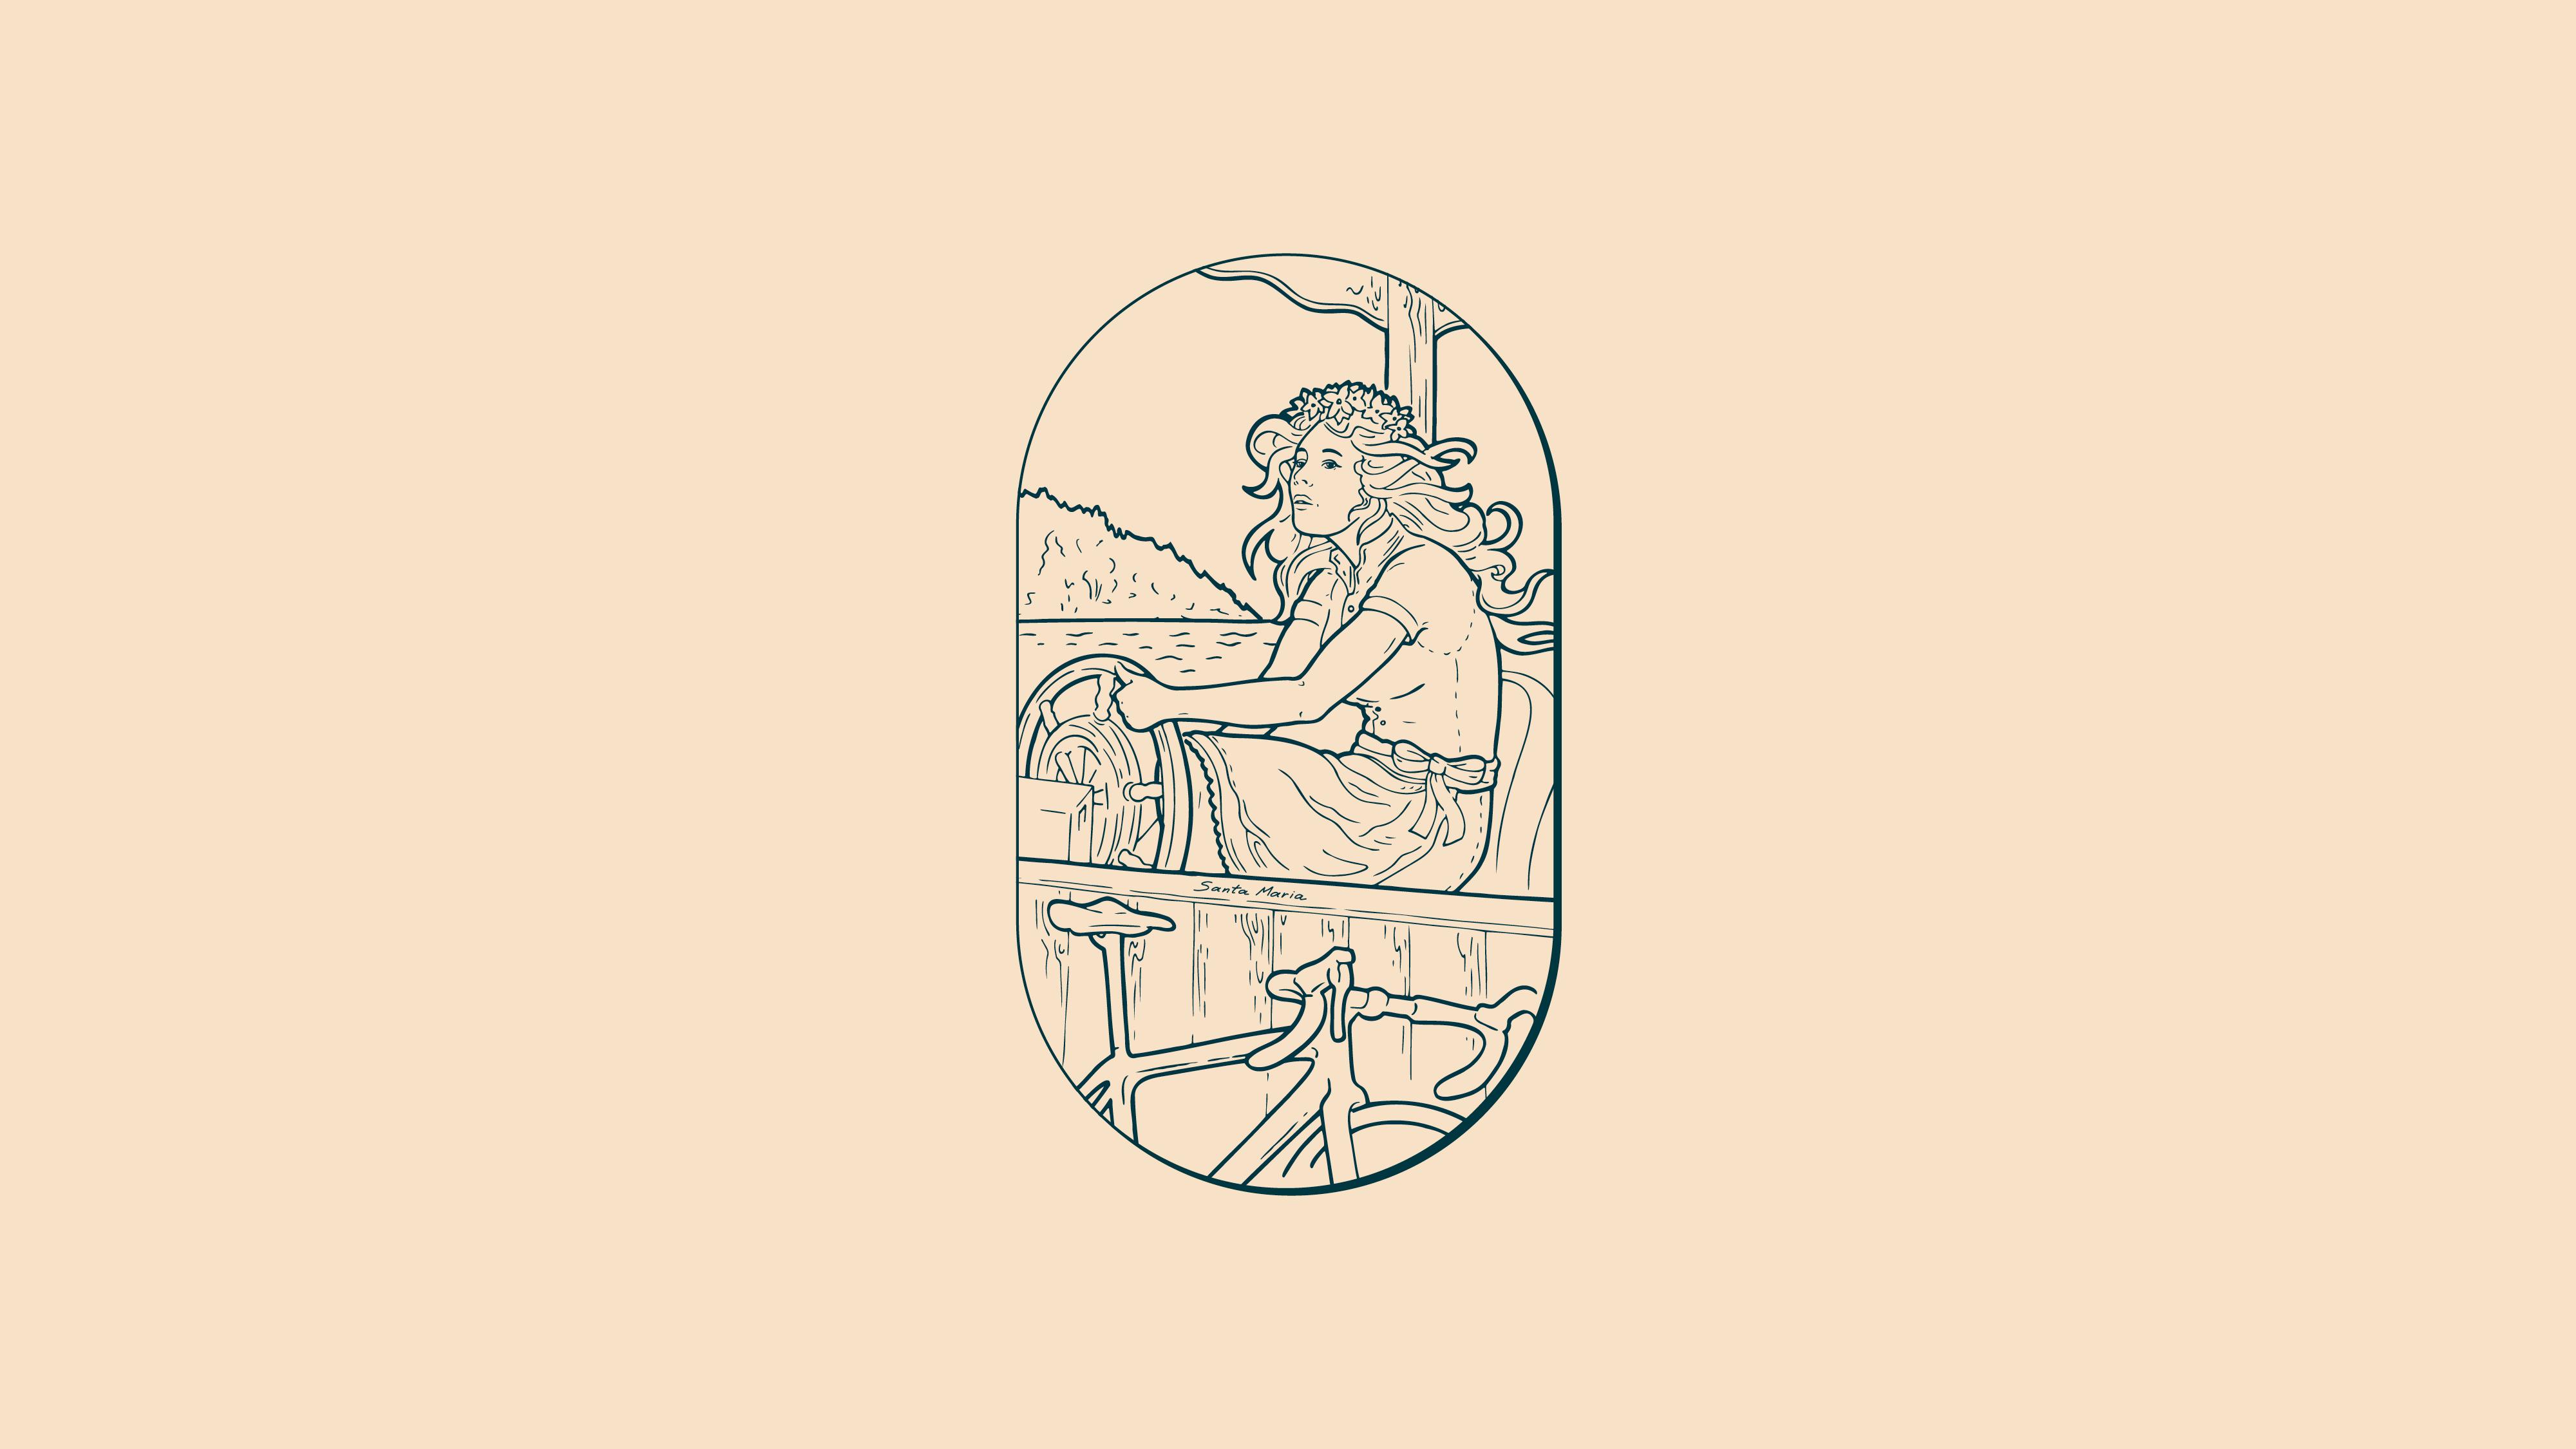 Ref Faehrfrau Website 1 Illustration 2